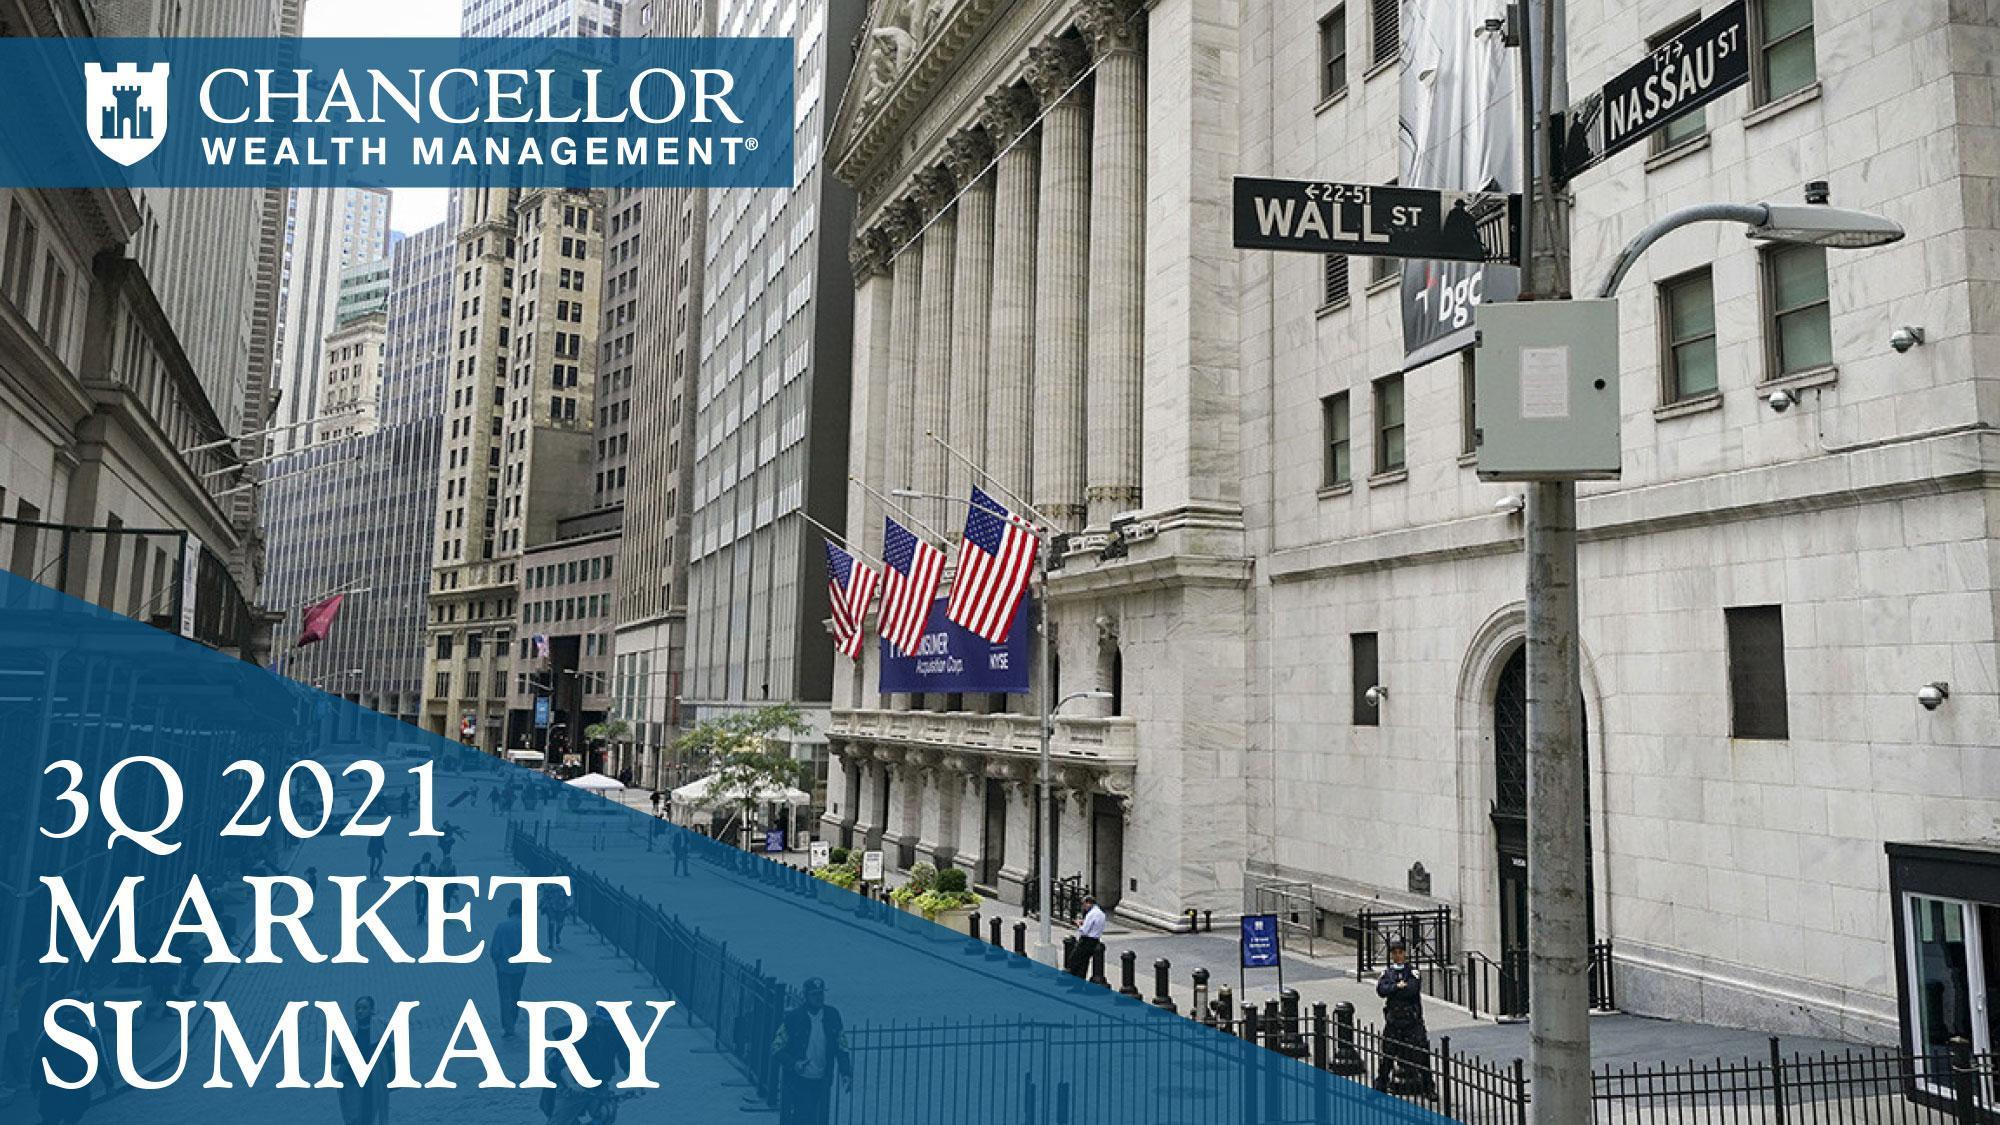 Market Summary 3Q 2021 Thumbnail